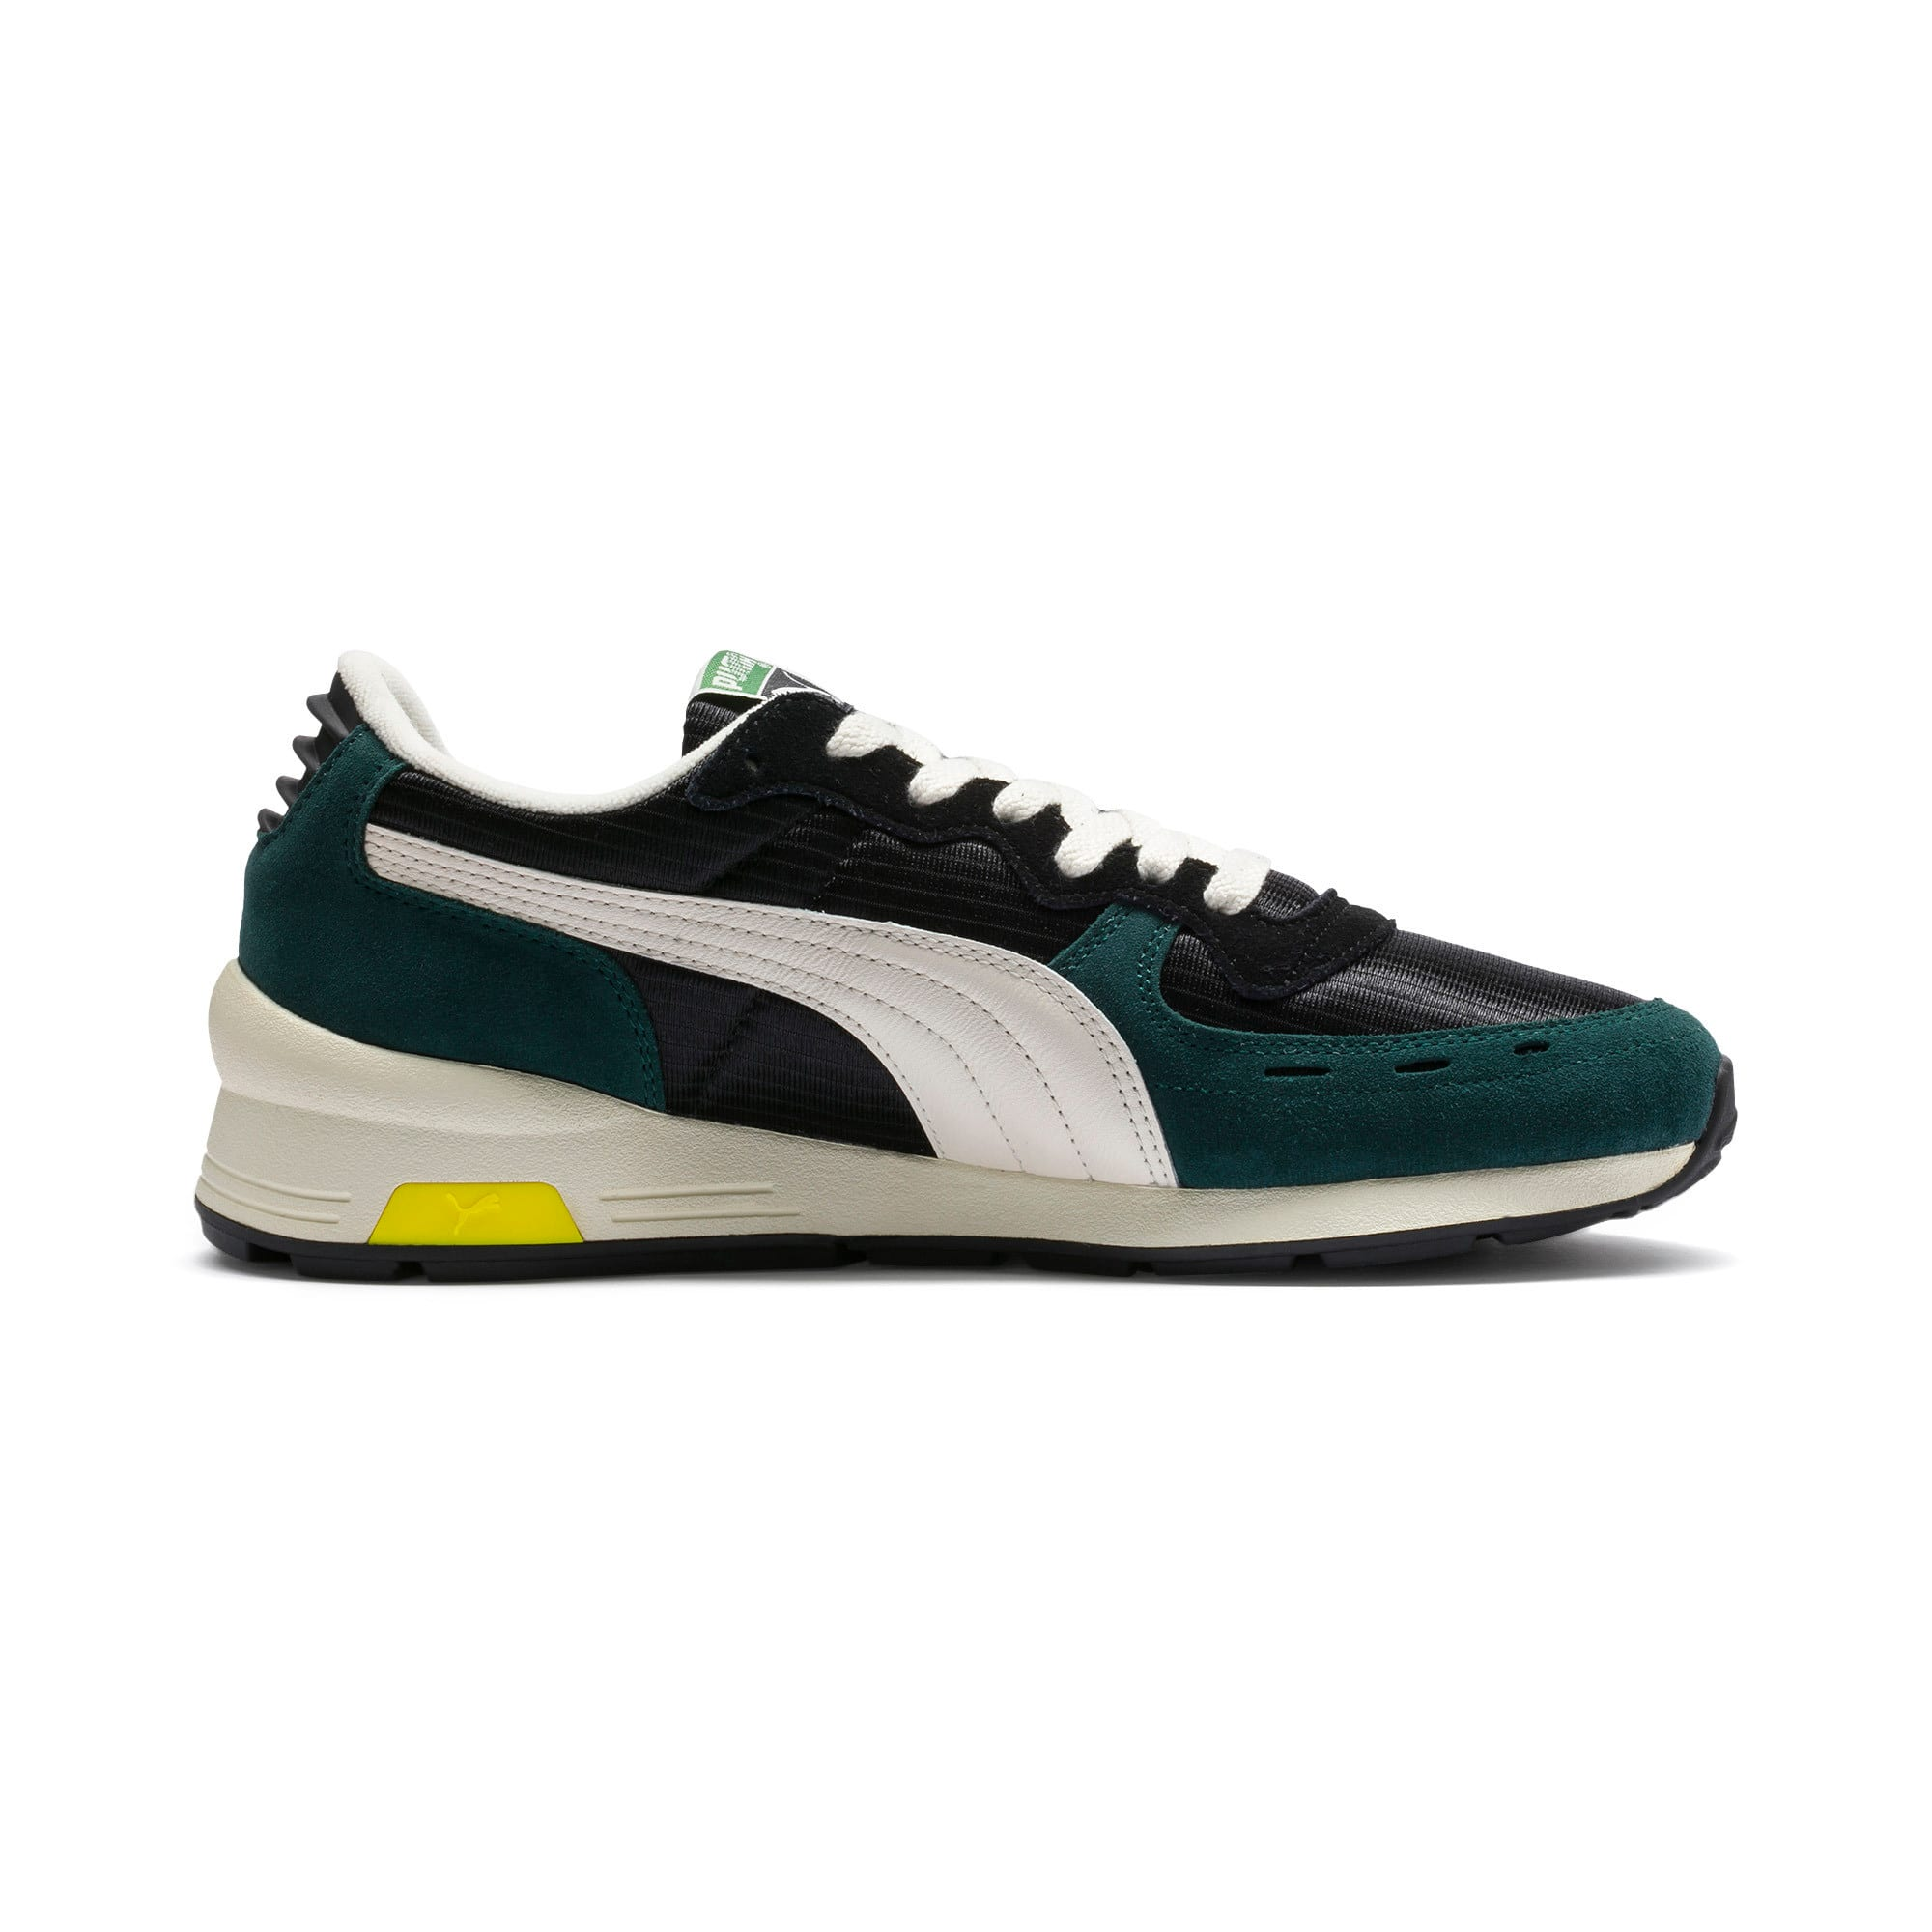 Thumbnail 6 of RS-350 OG Men's Sneakers, Puma Black-Ponderosa Pine, medium